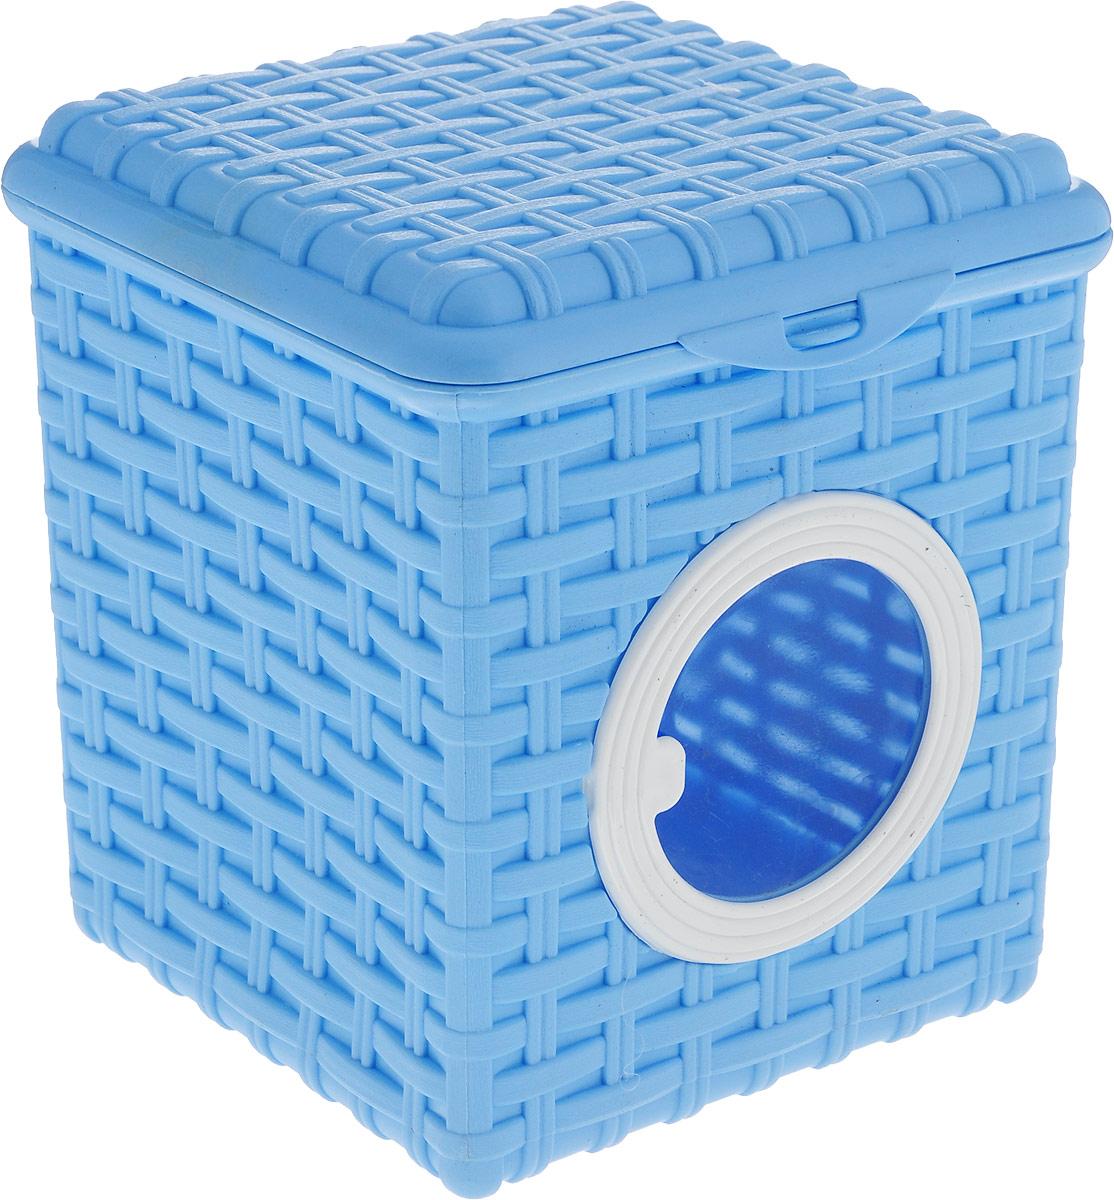 Корзина для мелочей Violet, цвет: голубой, 3 л корзина bask h441zw 3